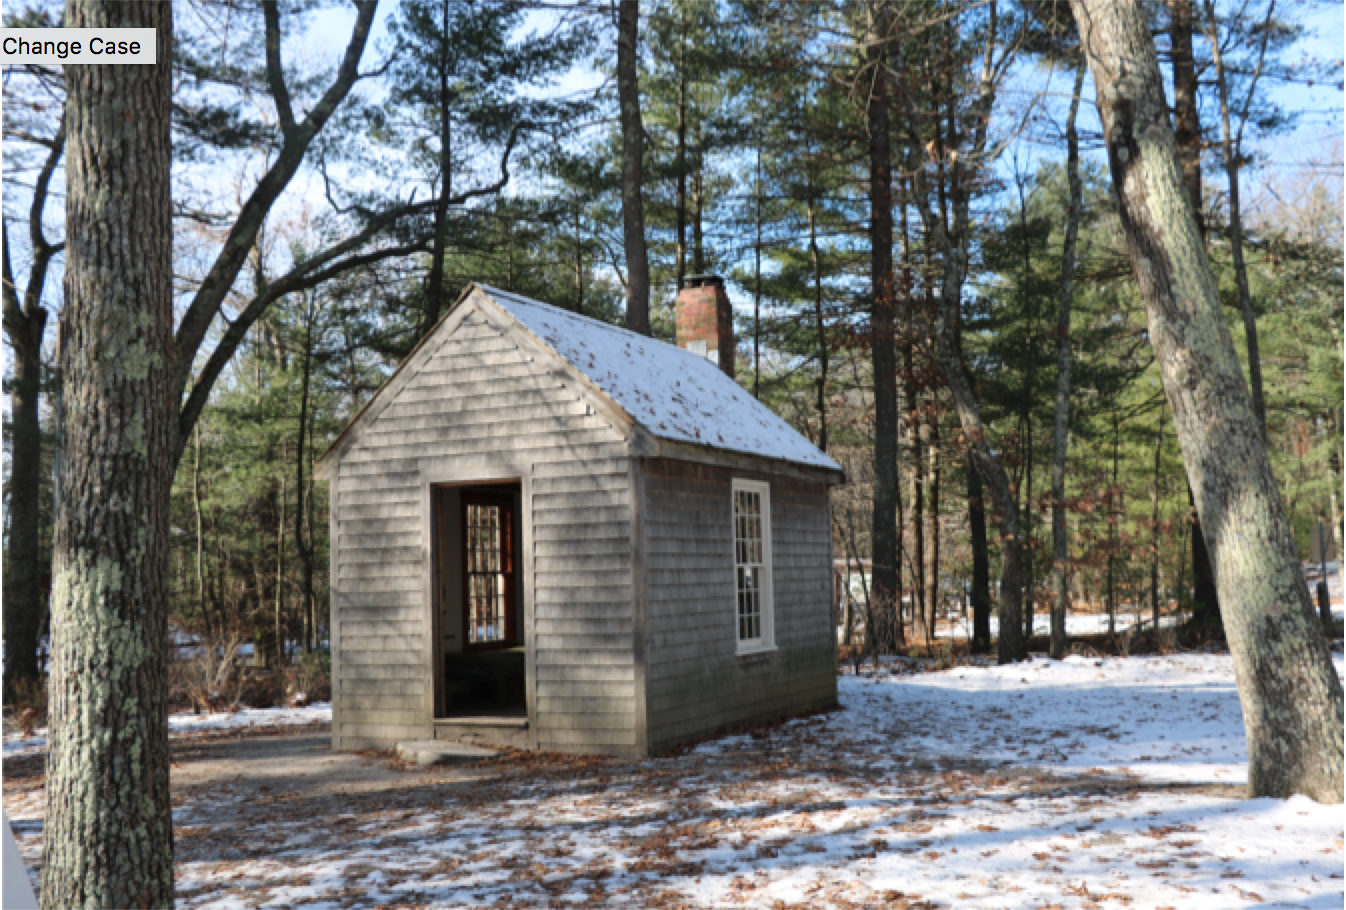 Replica of Thoreau's homestead